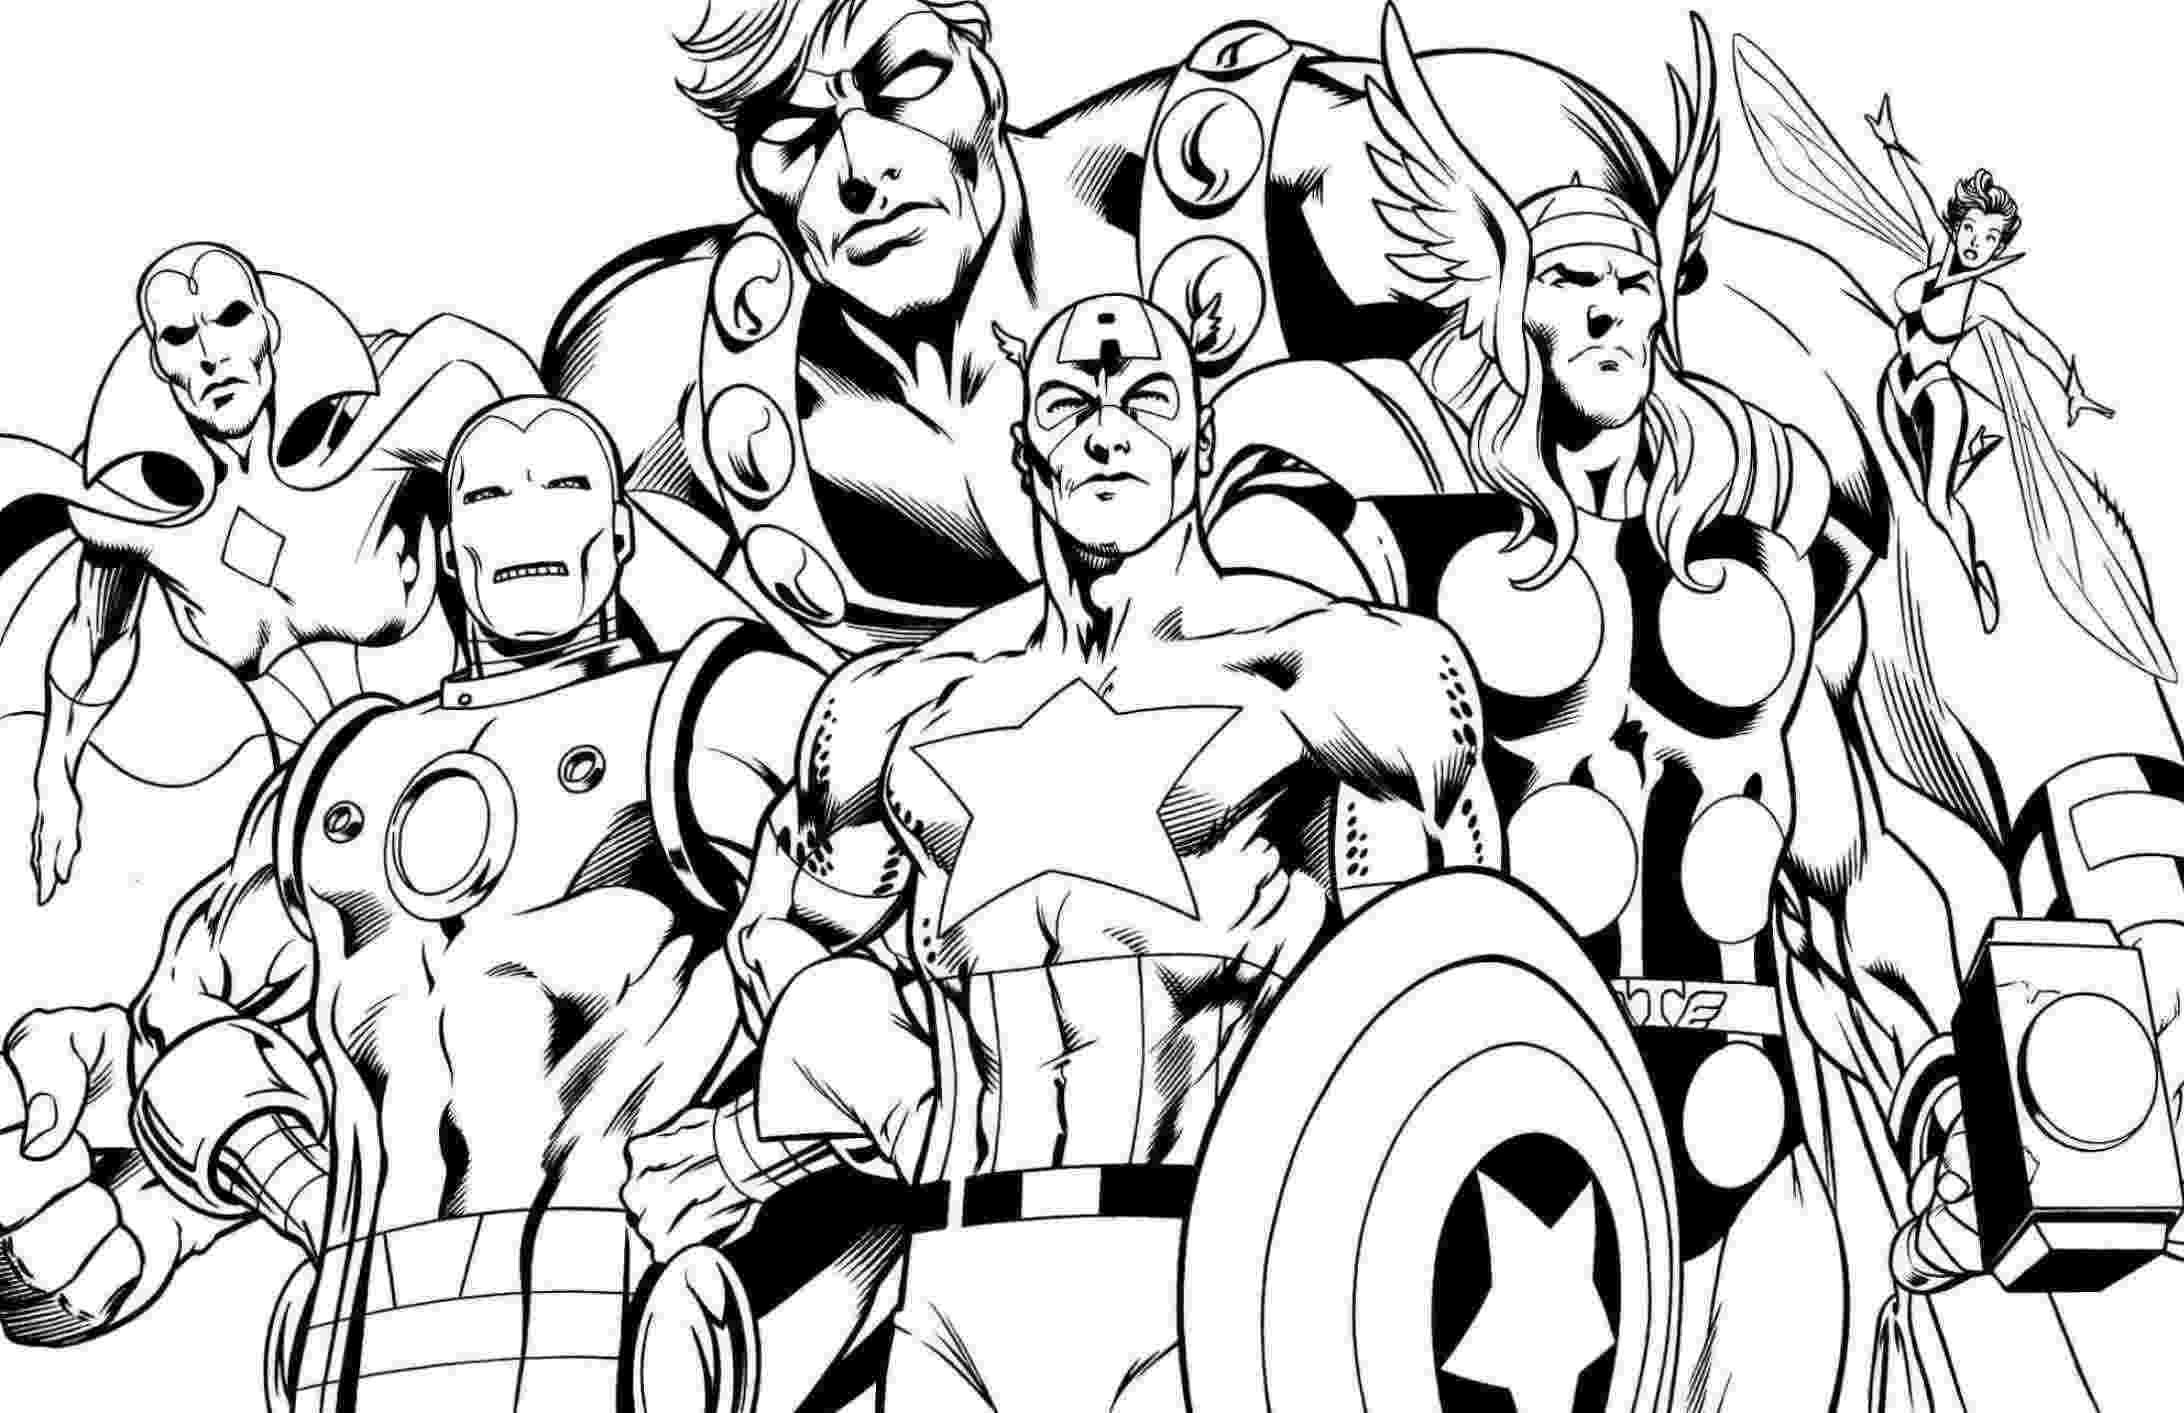 avengers color pages superhero coloring pages best coloring pages for kids pages avengers color